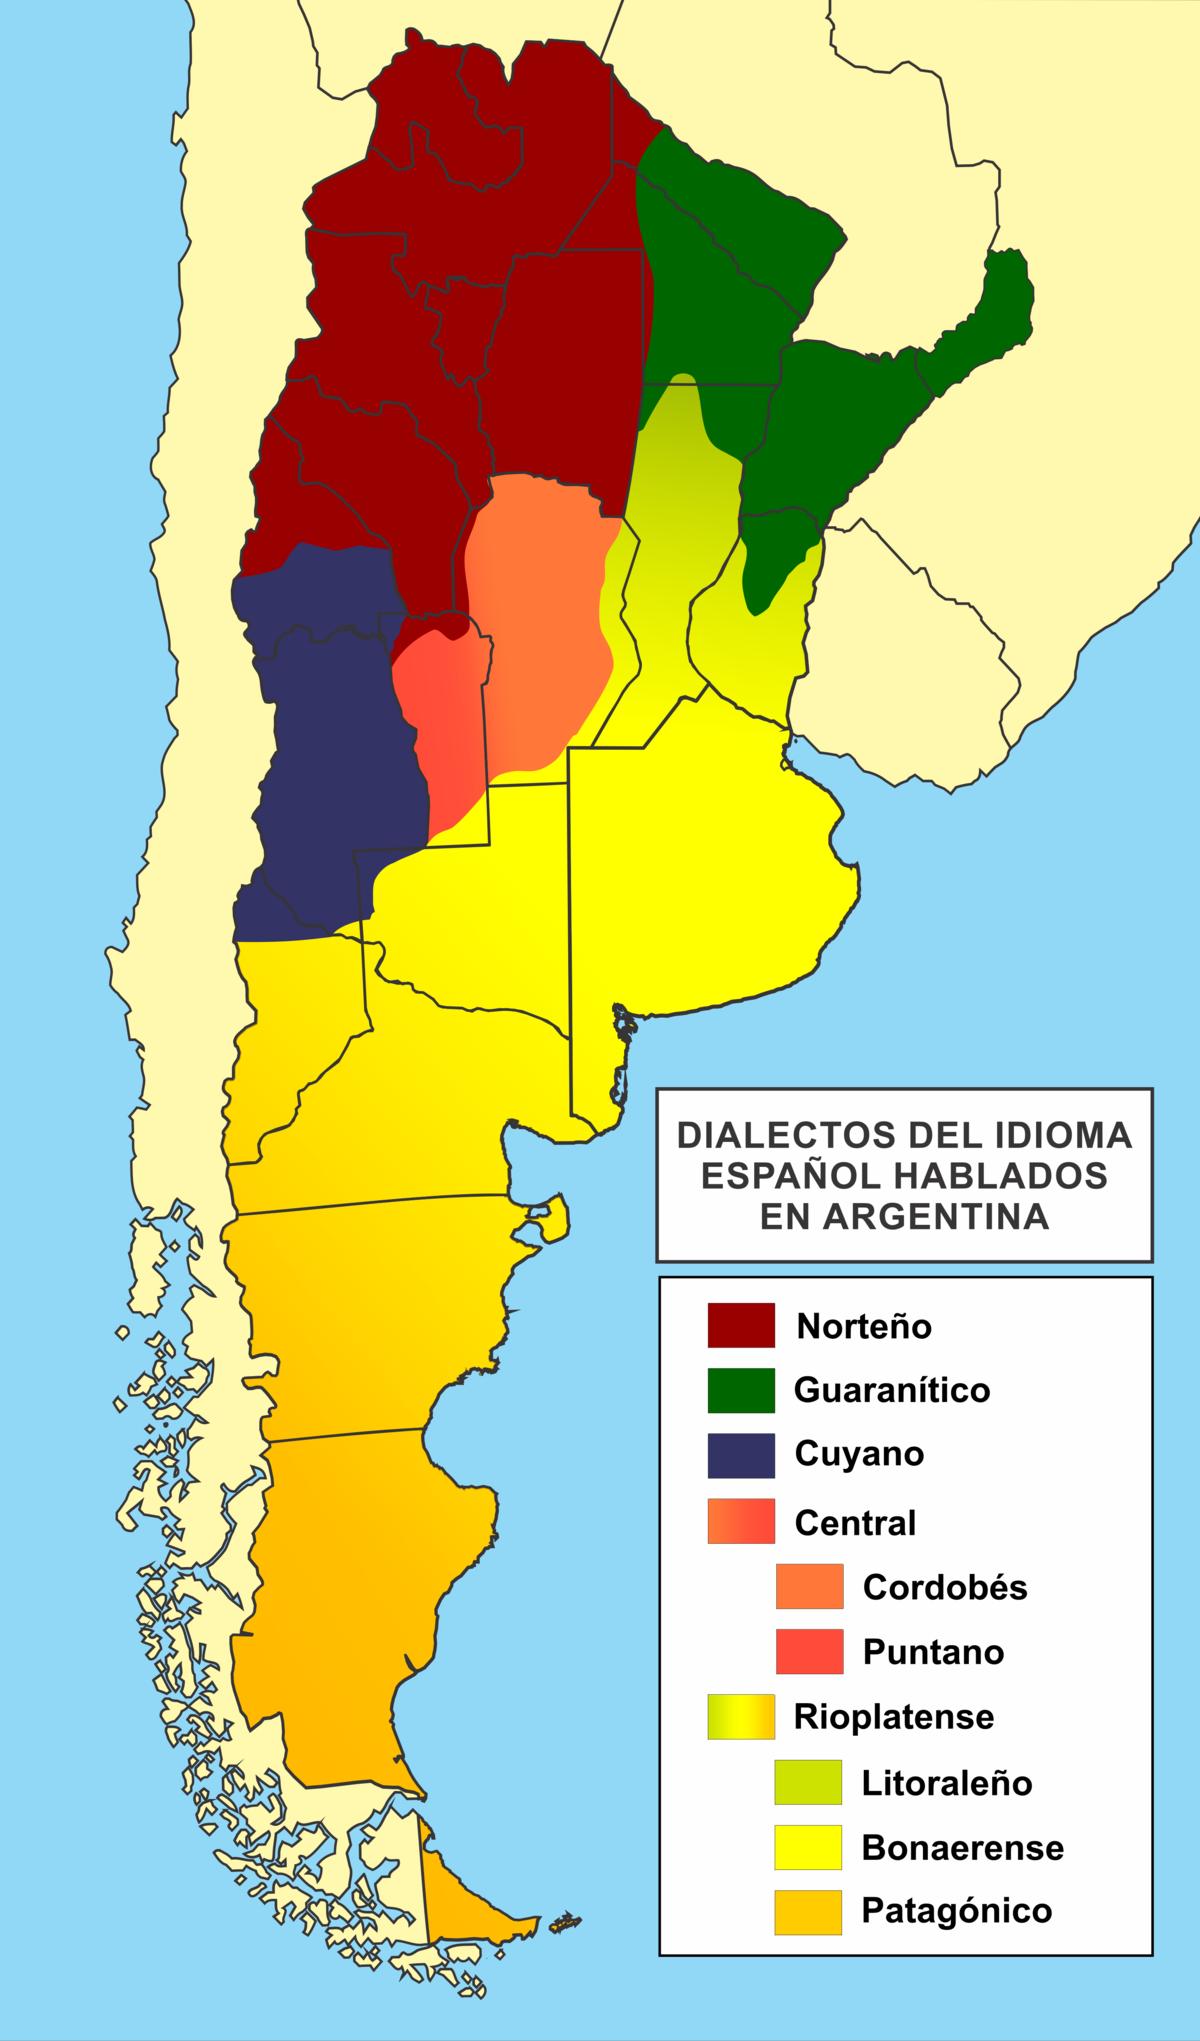 Maduros en comunidad Córdoba na-6663